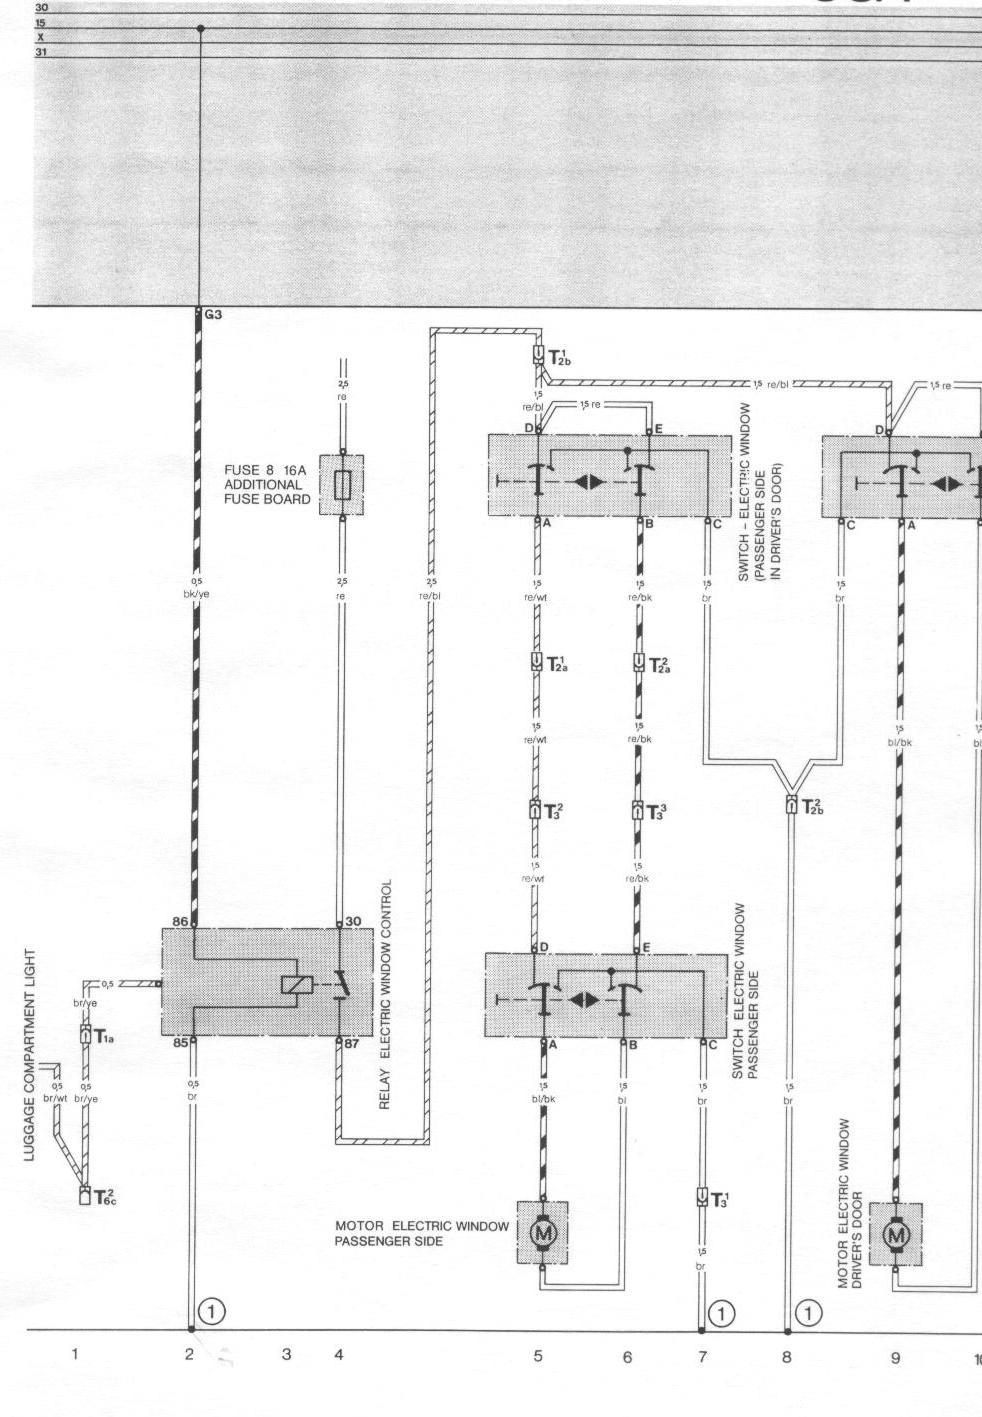 symbols for electrical wiring diagrams rj12 diagram australia pelican parts: porsche 924/944